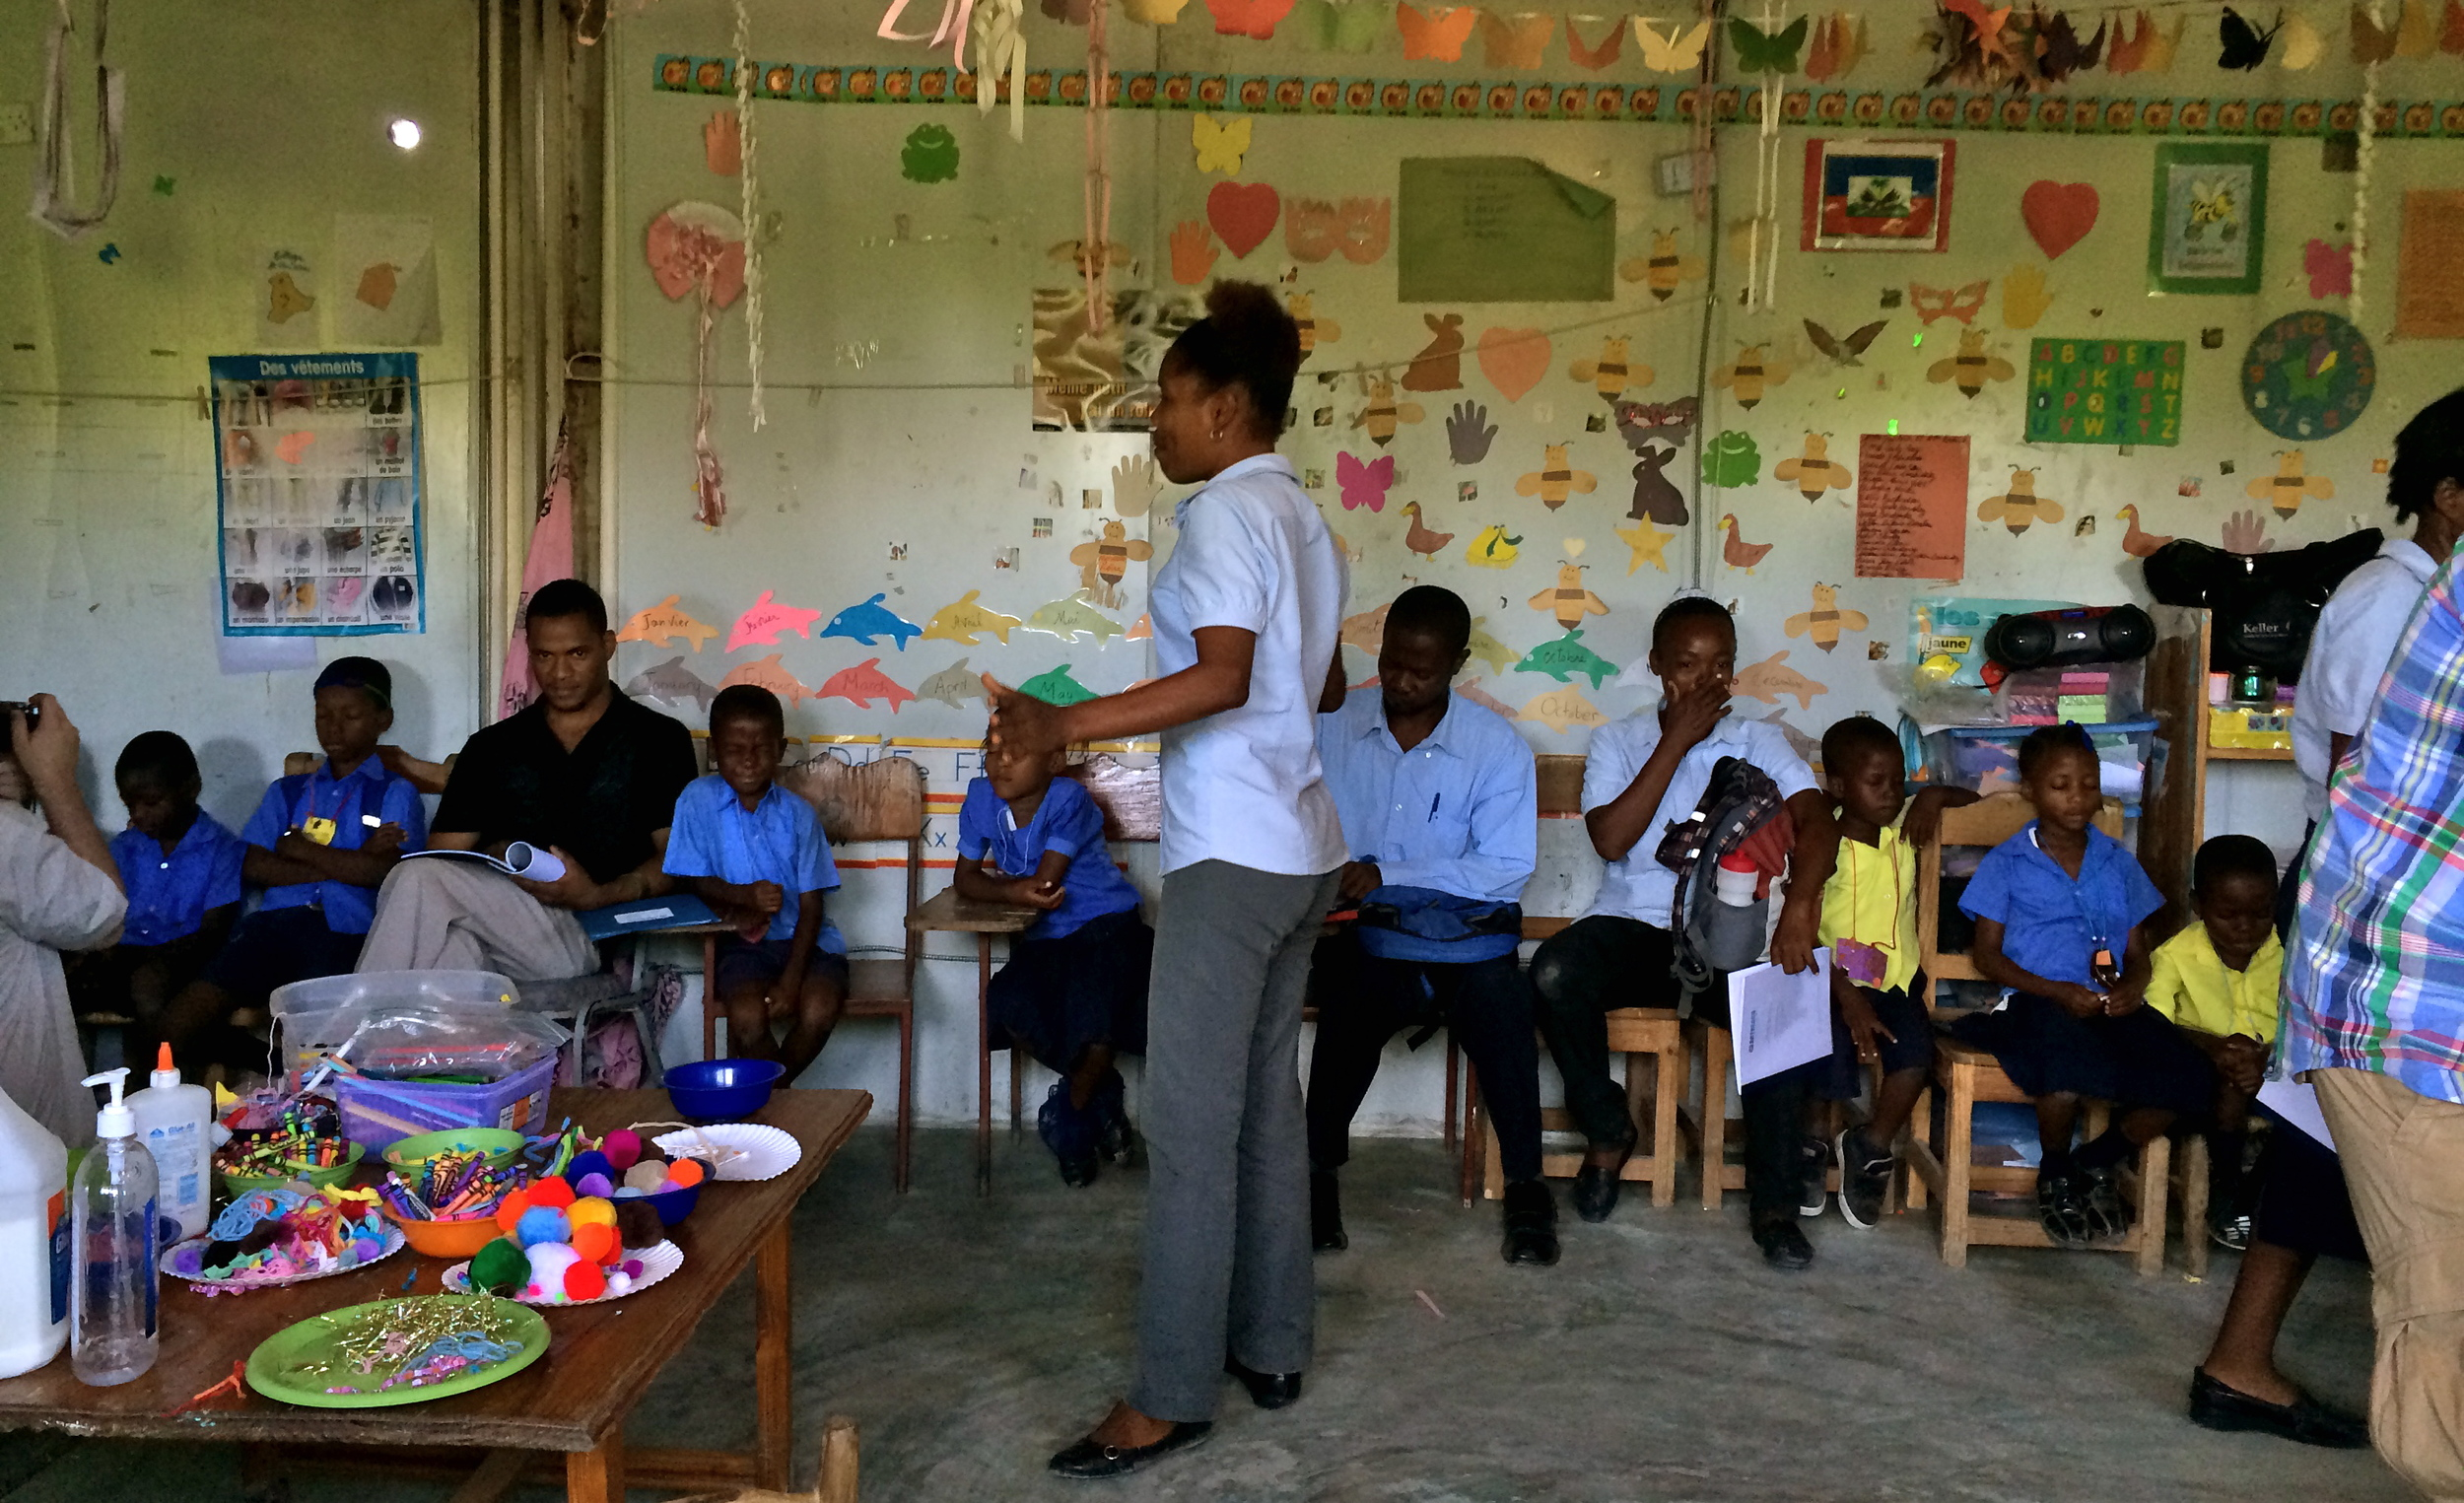 Working in Metaphor | ArtReach Workshop | Haiti 2014